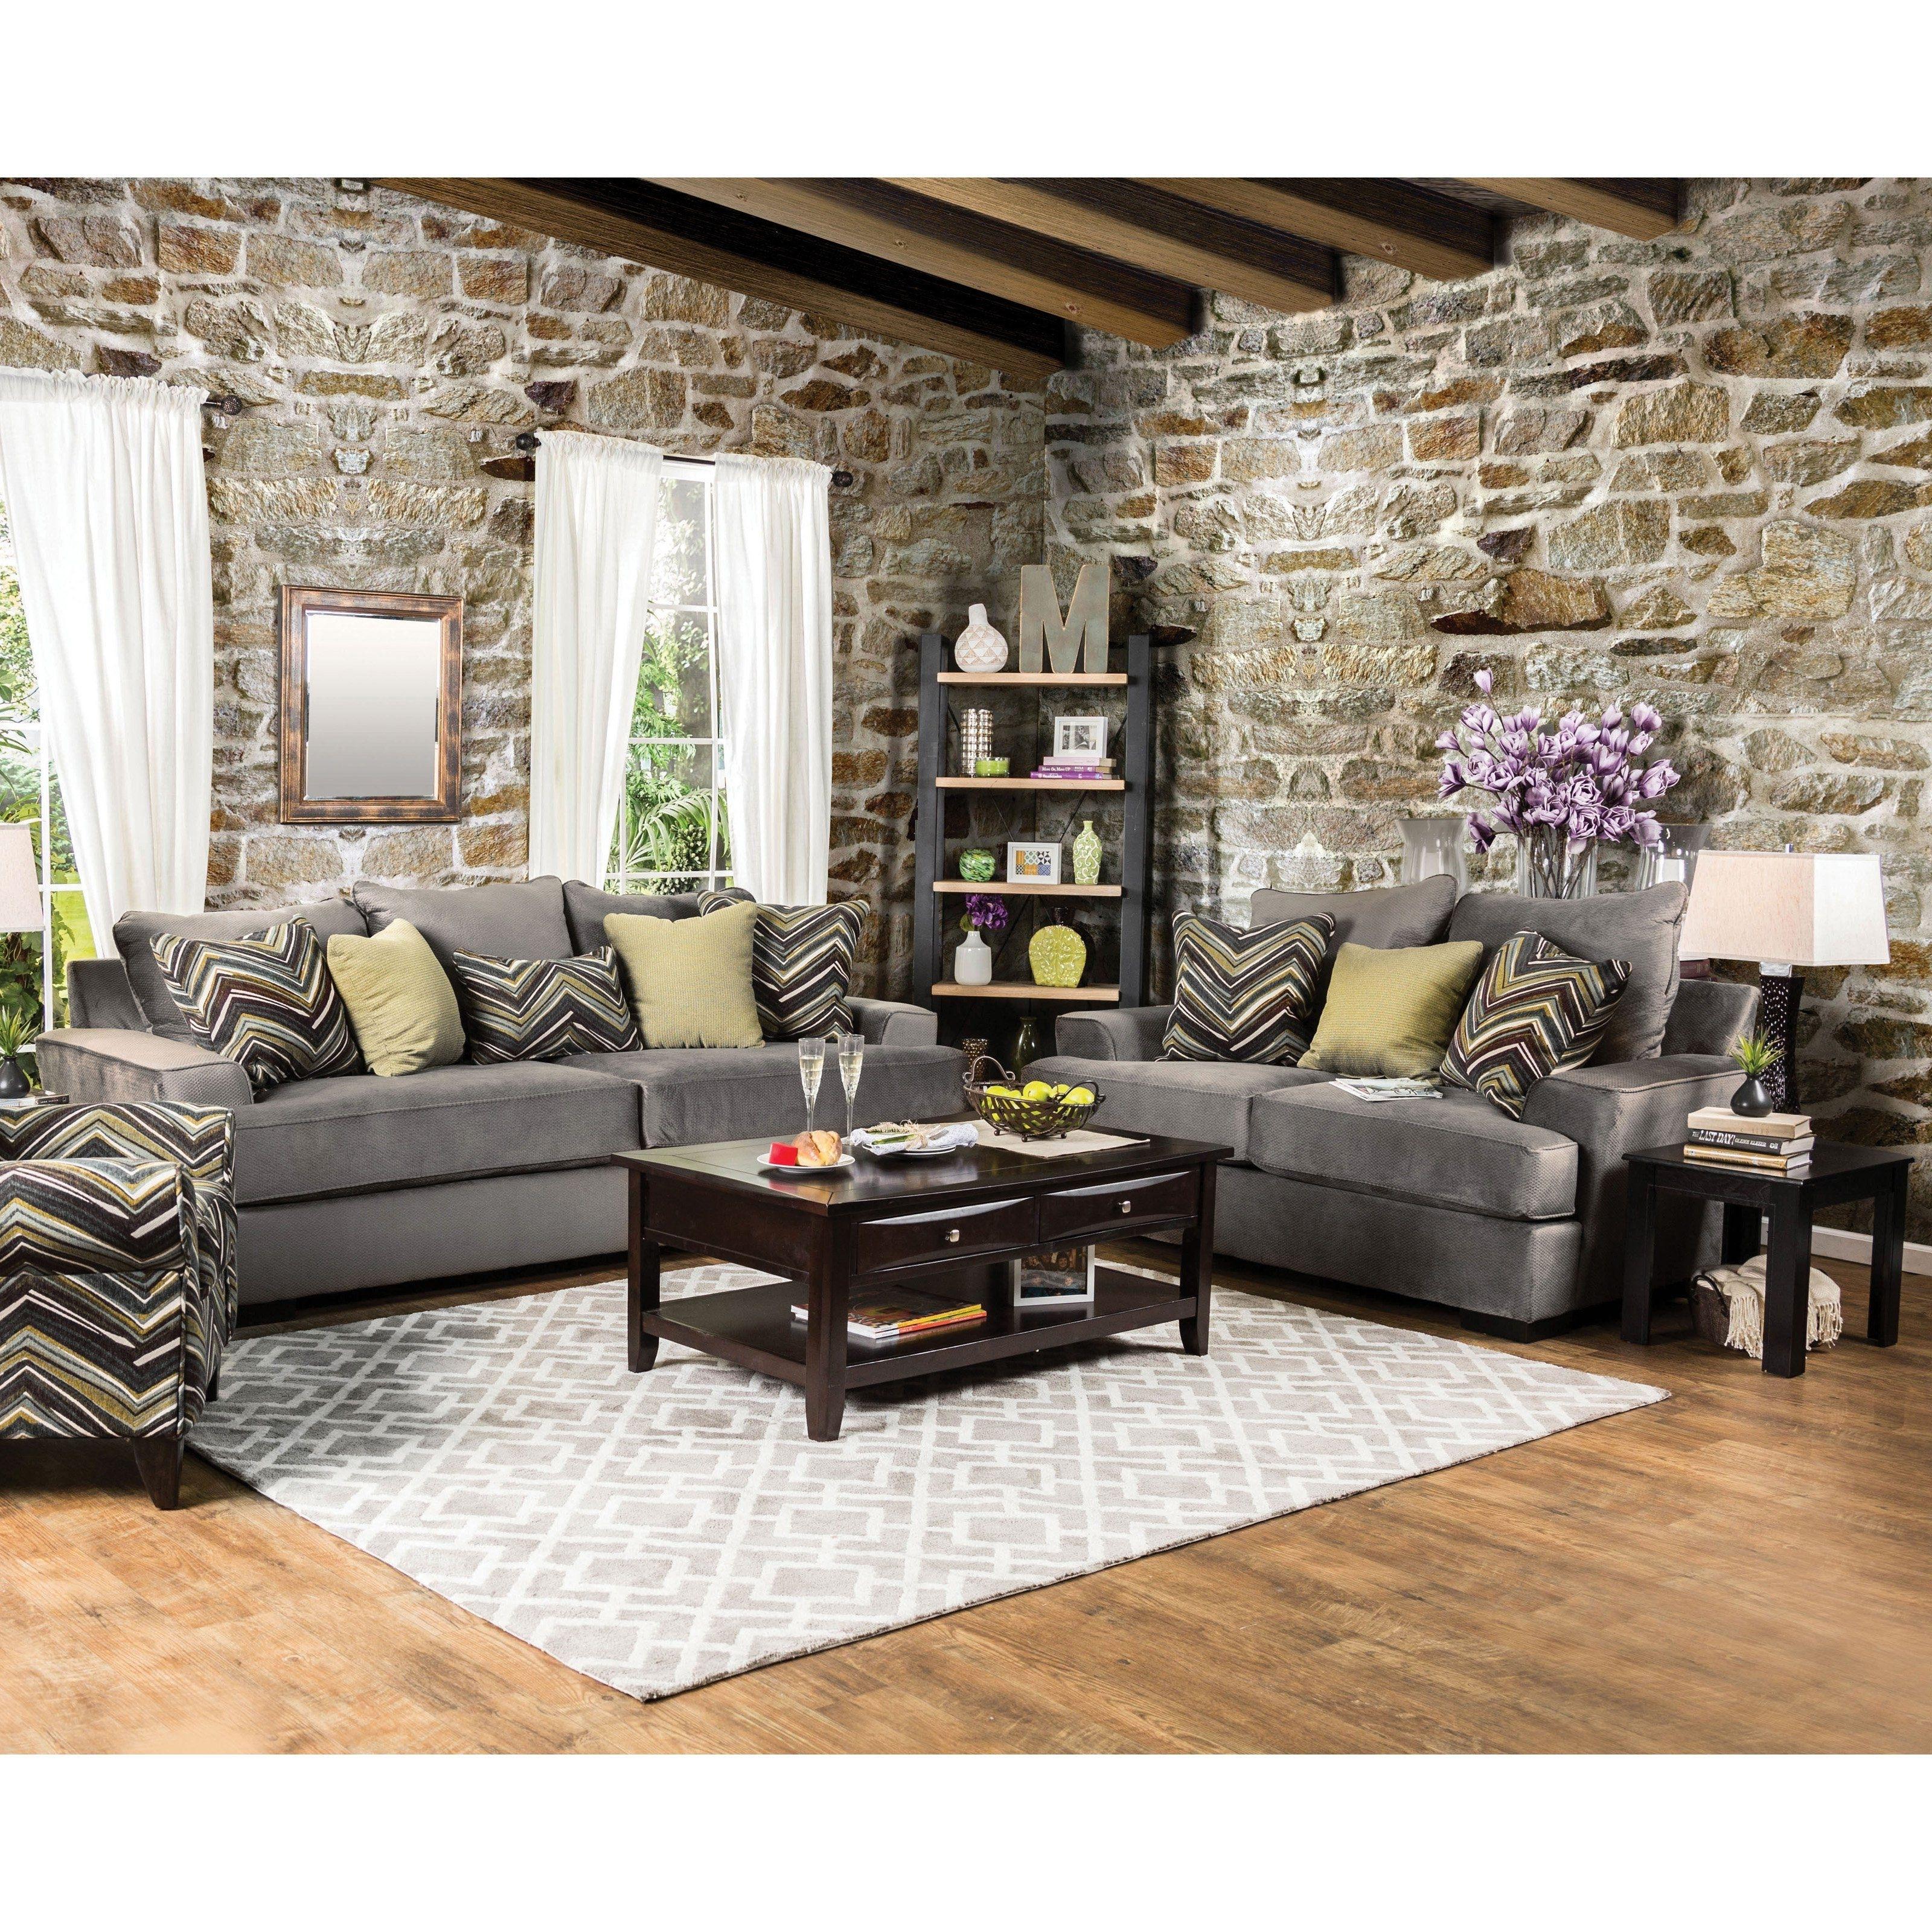 Furniture Of America Marius Simple Living 2 Piece Sofa Set - Idf with Marius Dark Grey 3 Piece Sectionals (Image 9 of 30)